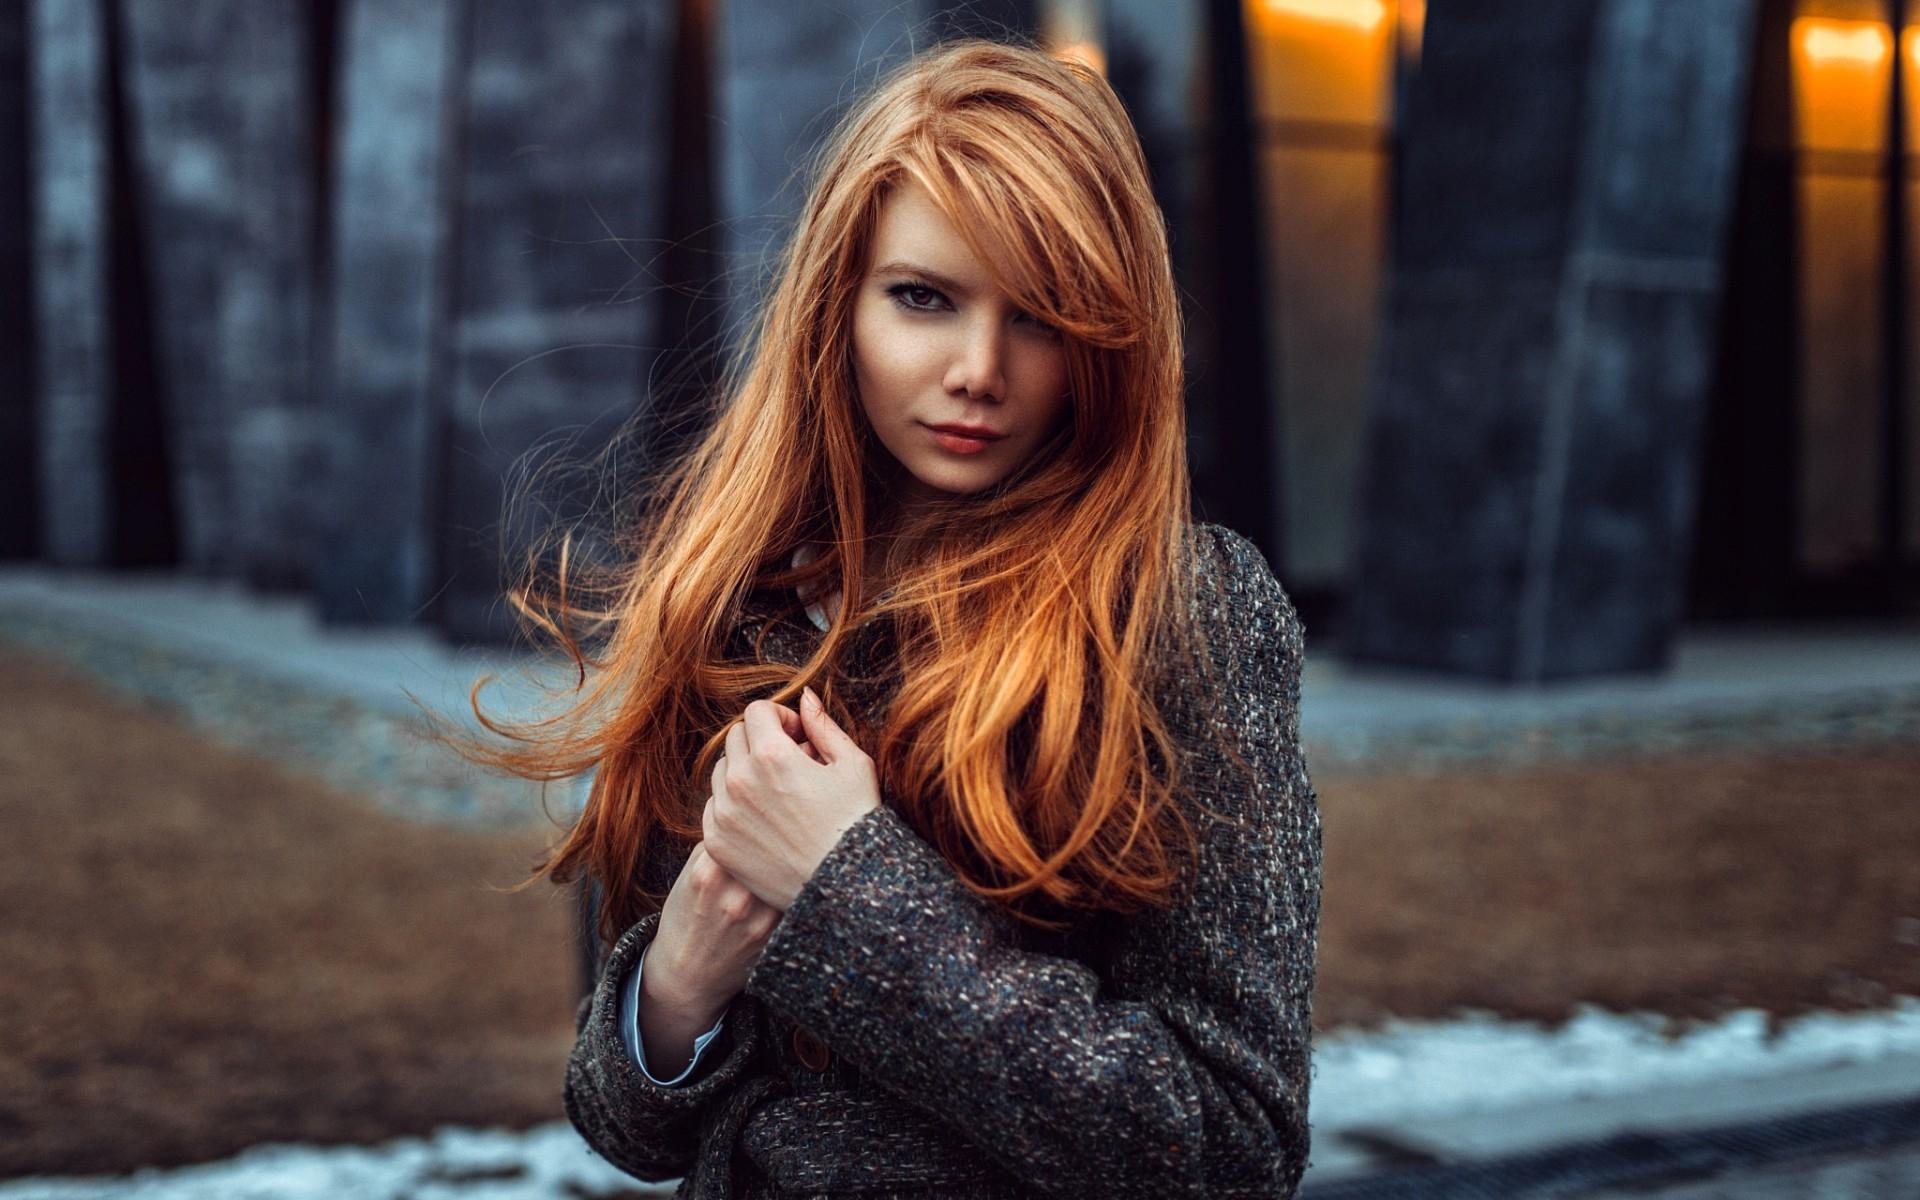 redhead-model-coat-red-lipstick-women-portrait-girls-8833